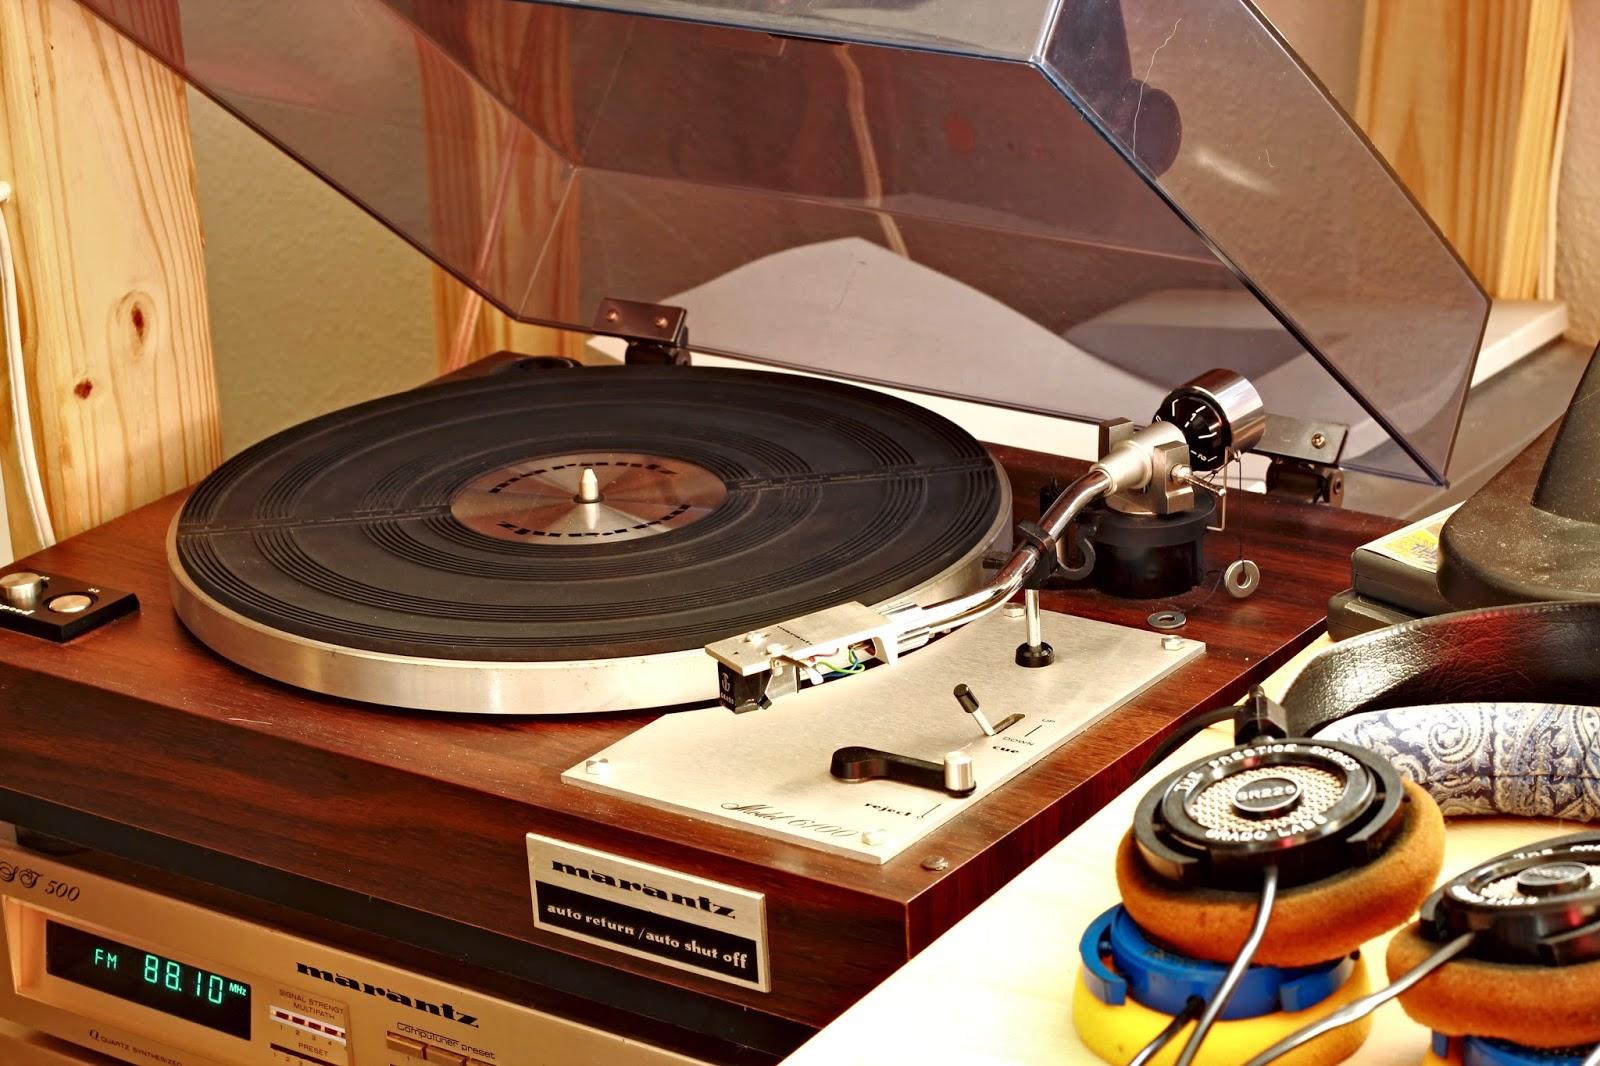 Golden Age Of Audio The Marantz 6100 Turntable